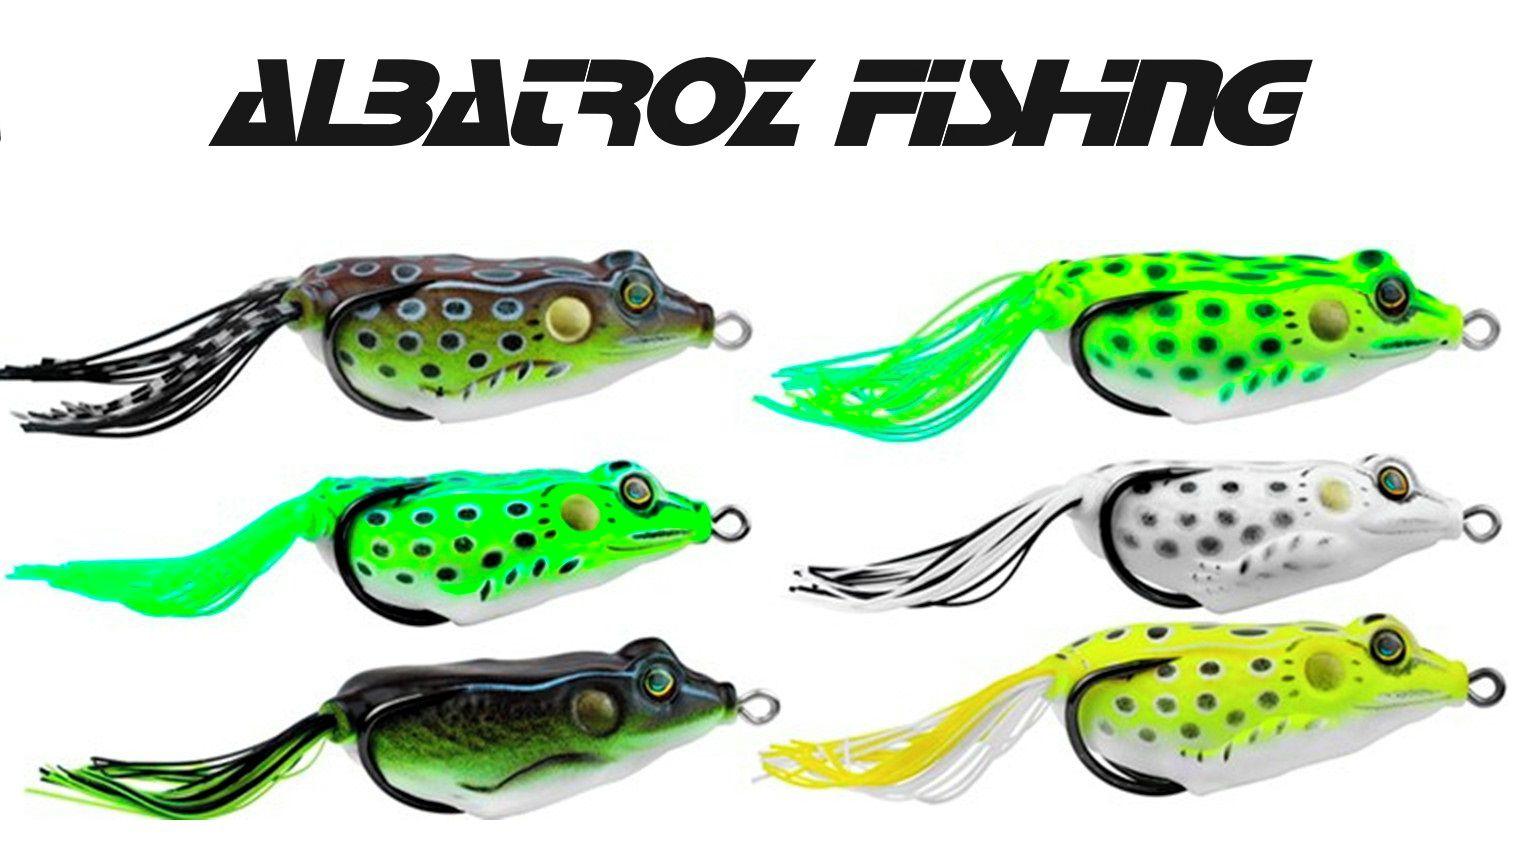 Isca Soft Top Frog XY-39 - Albatroz Fishing